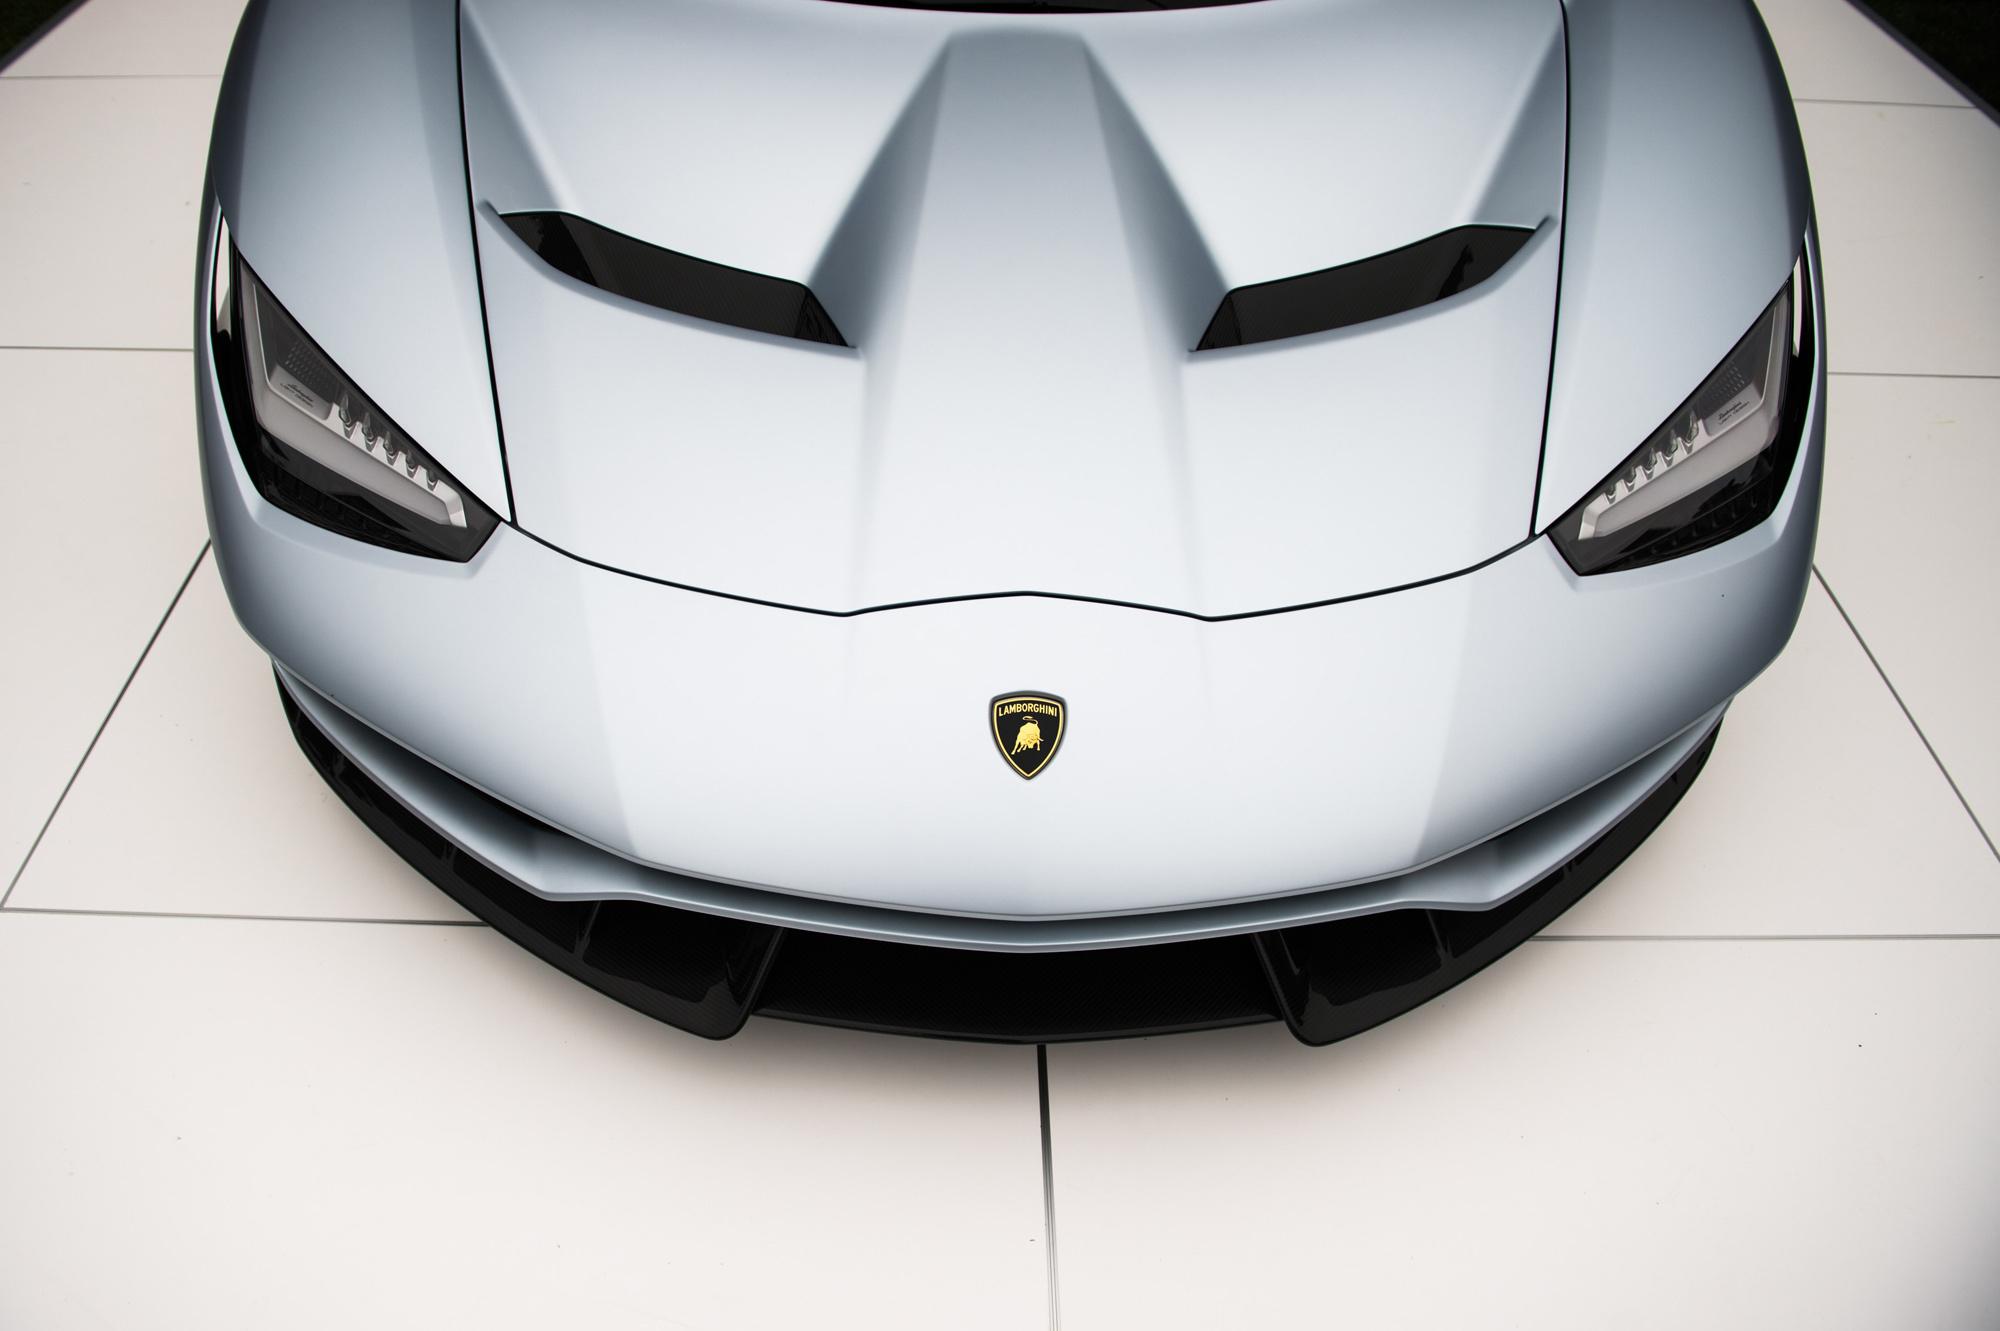 Lamborghini Centenario Roadster High Definition Wallpapers